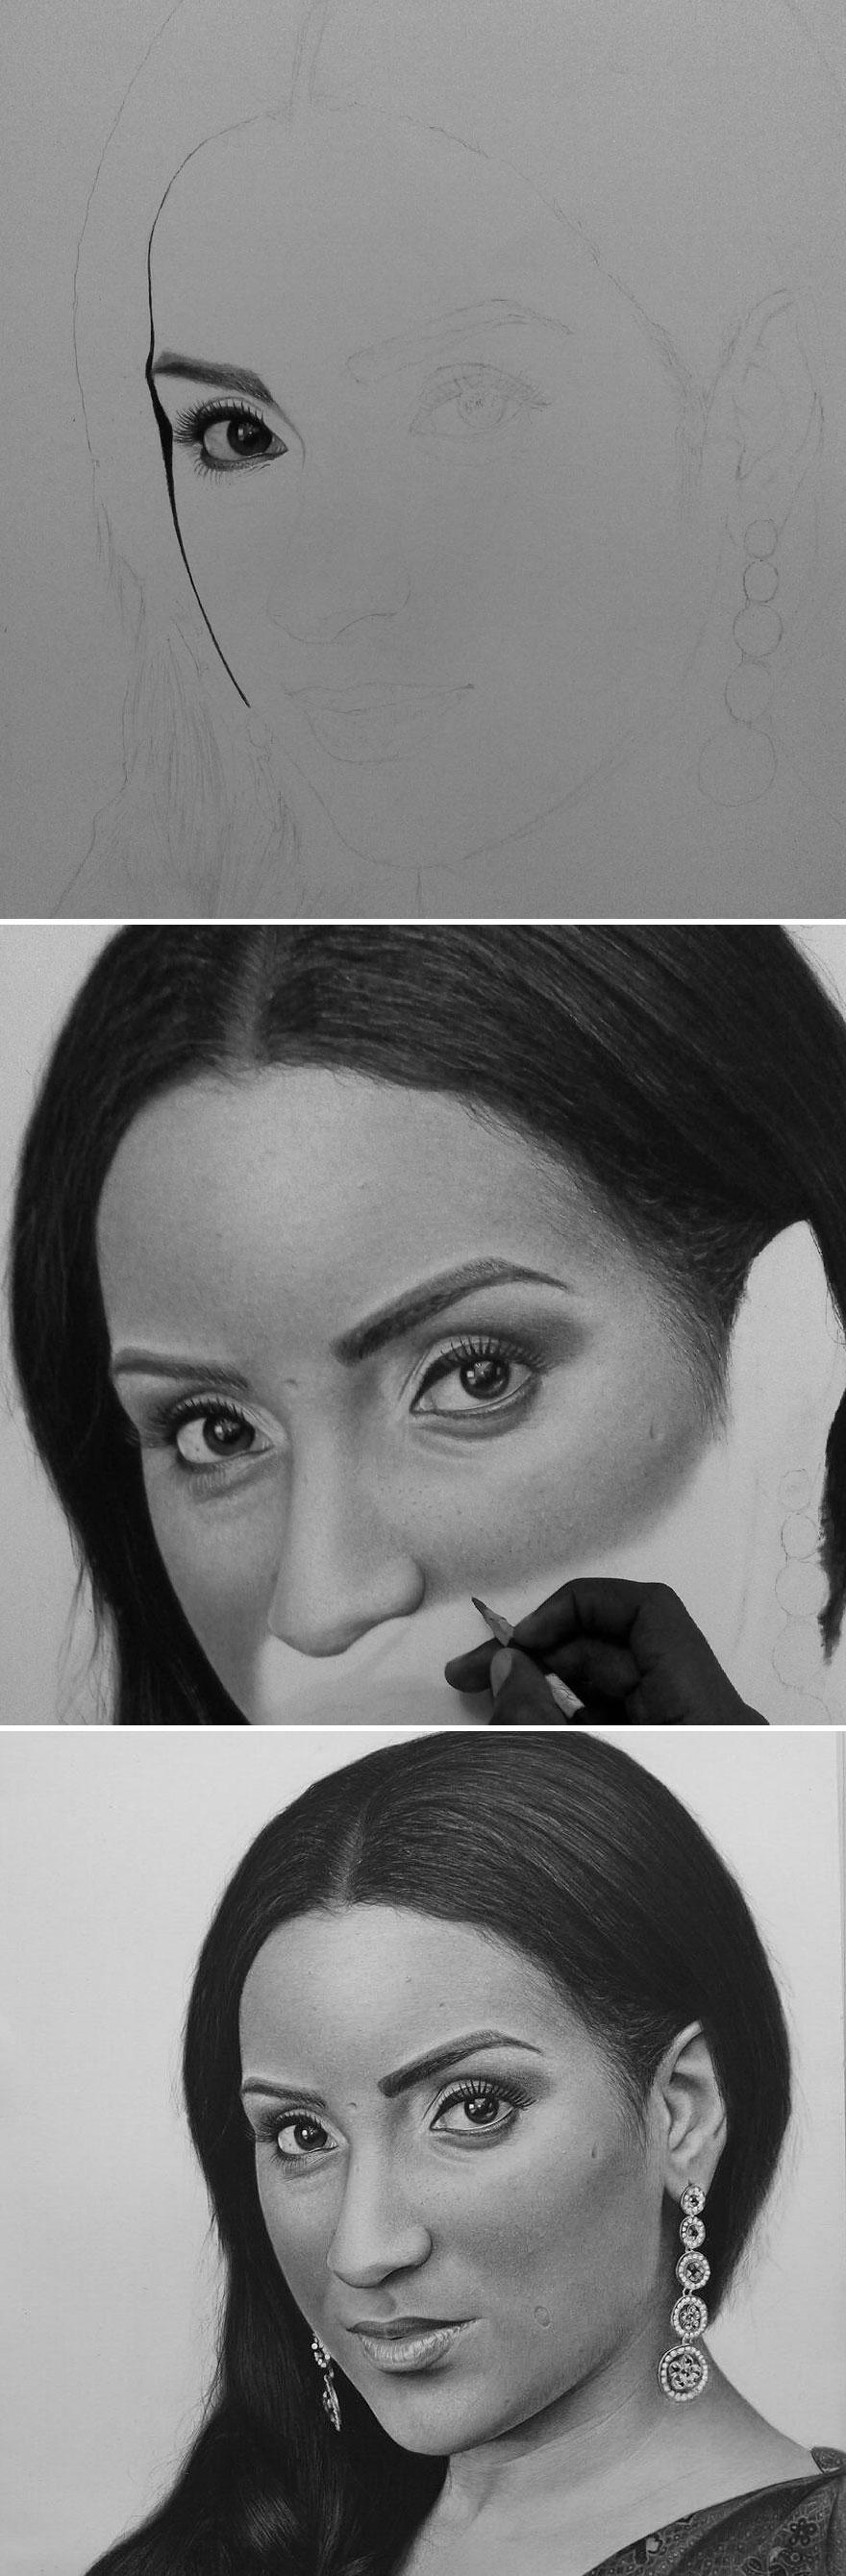 retrato-desenho-09